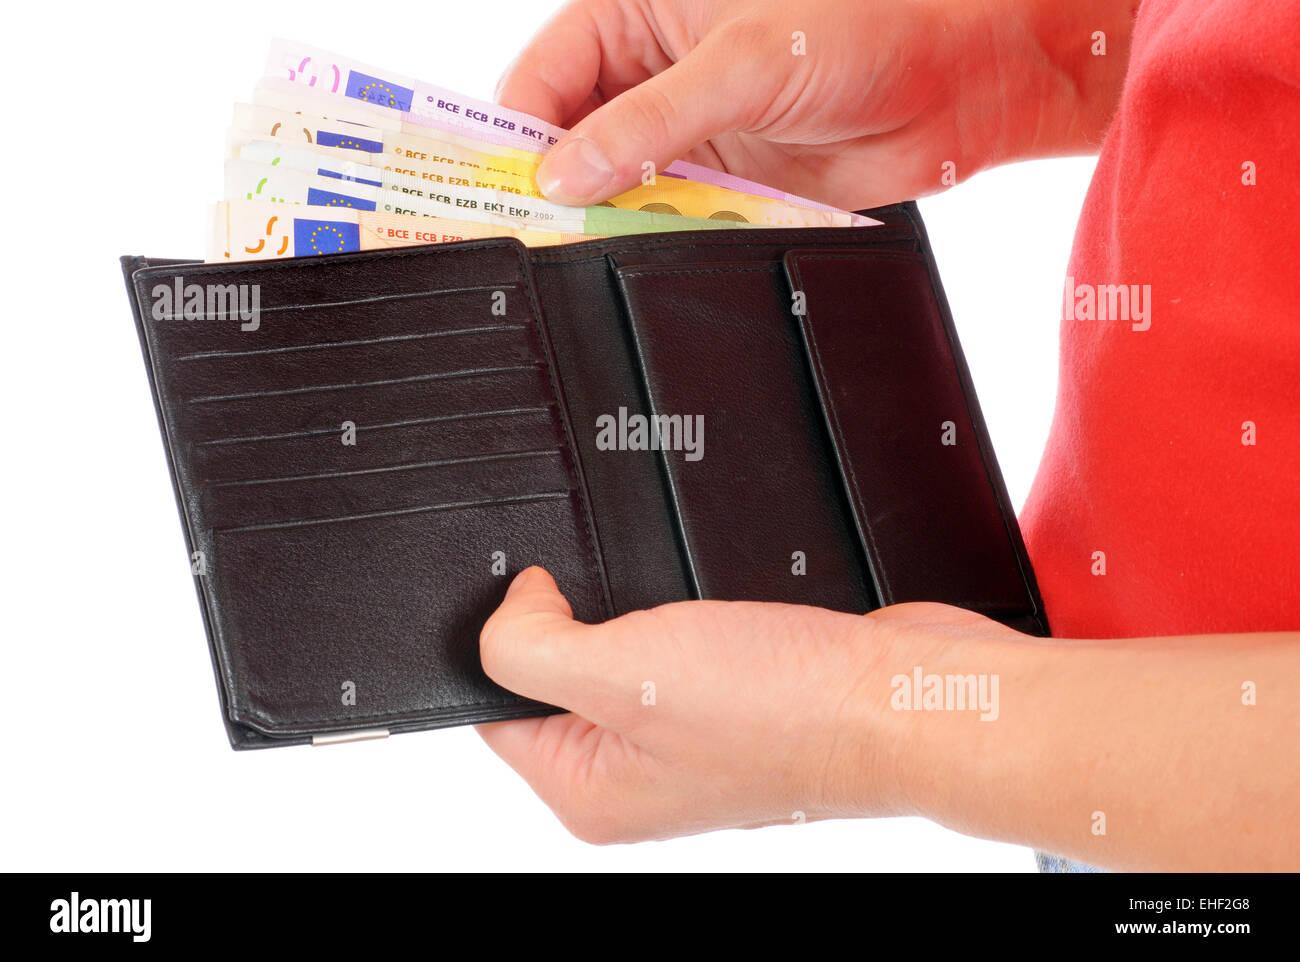 Geld / Money - Stock Image